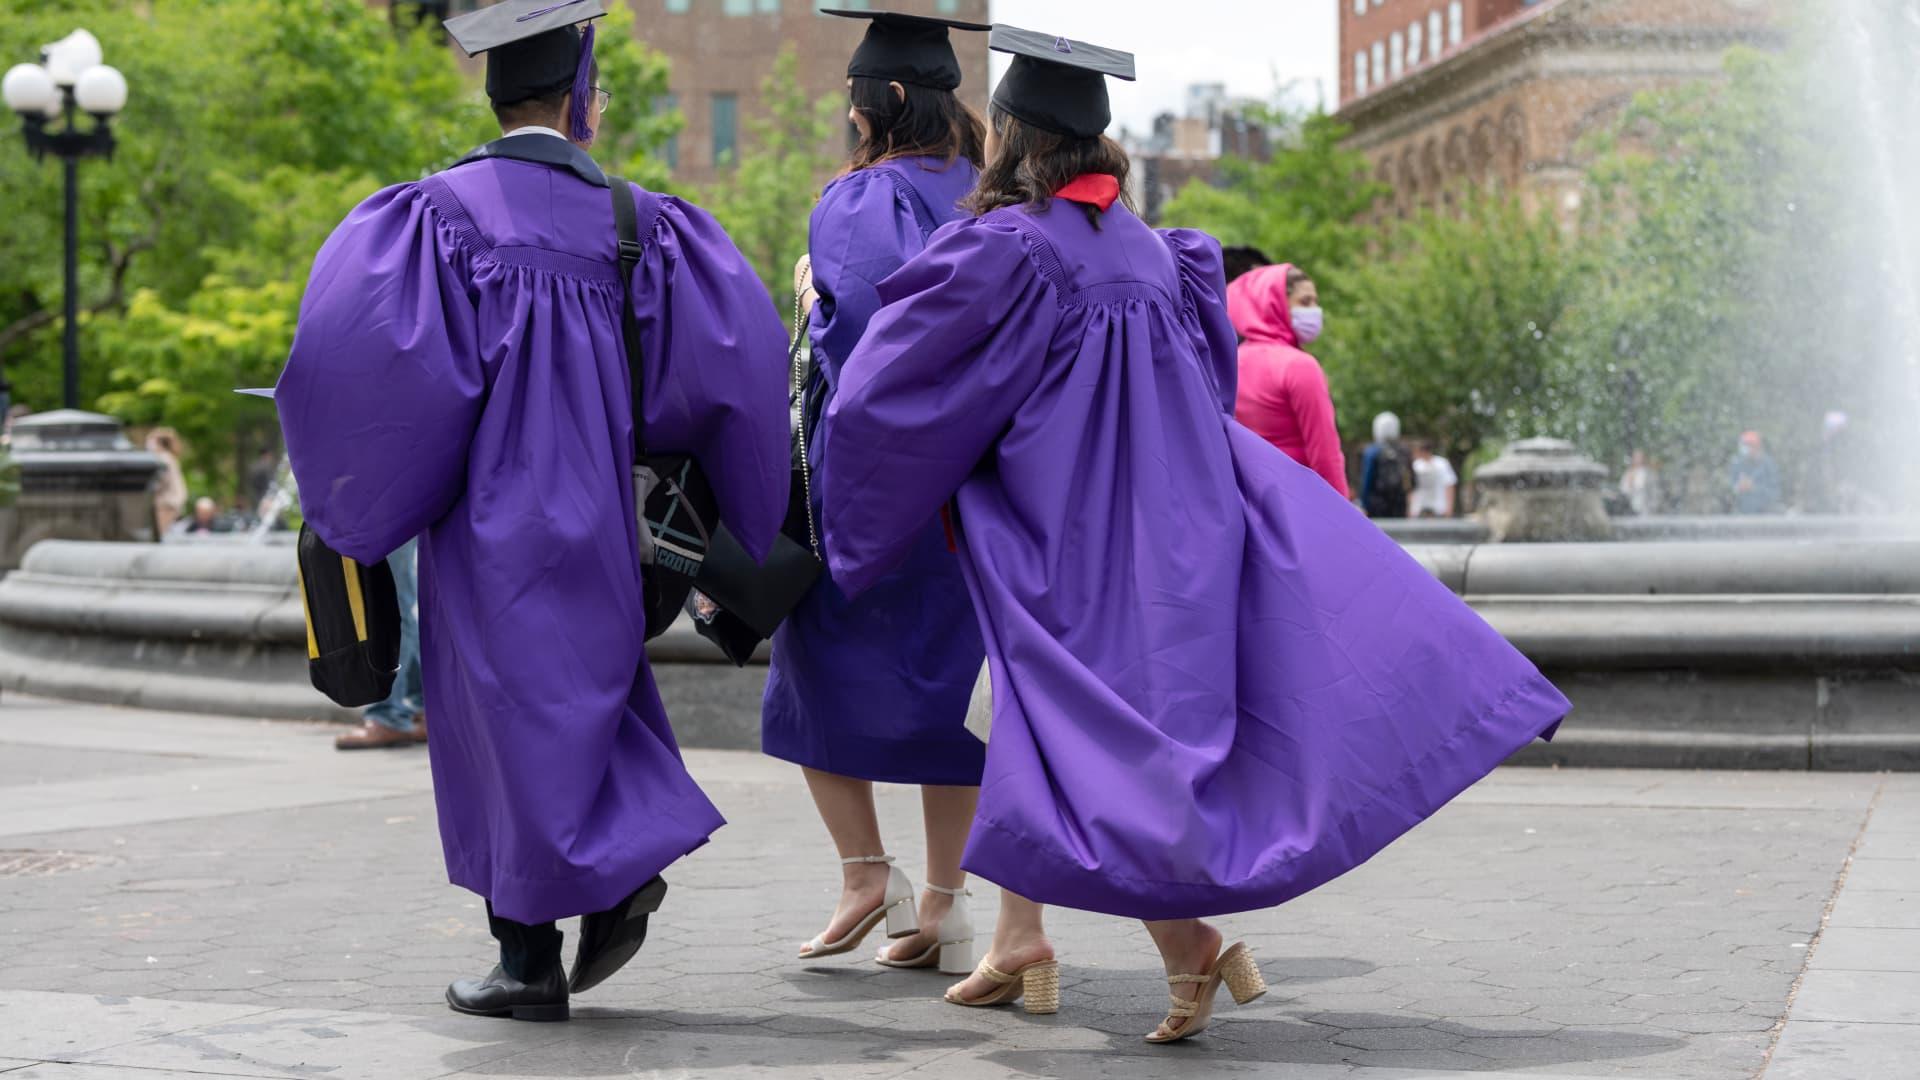 New York University graduates walk through New York's Washington Square Park on May 9, 2021.